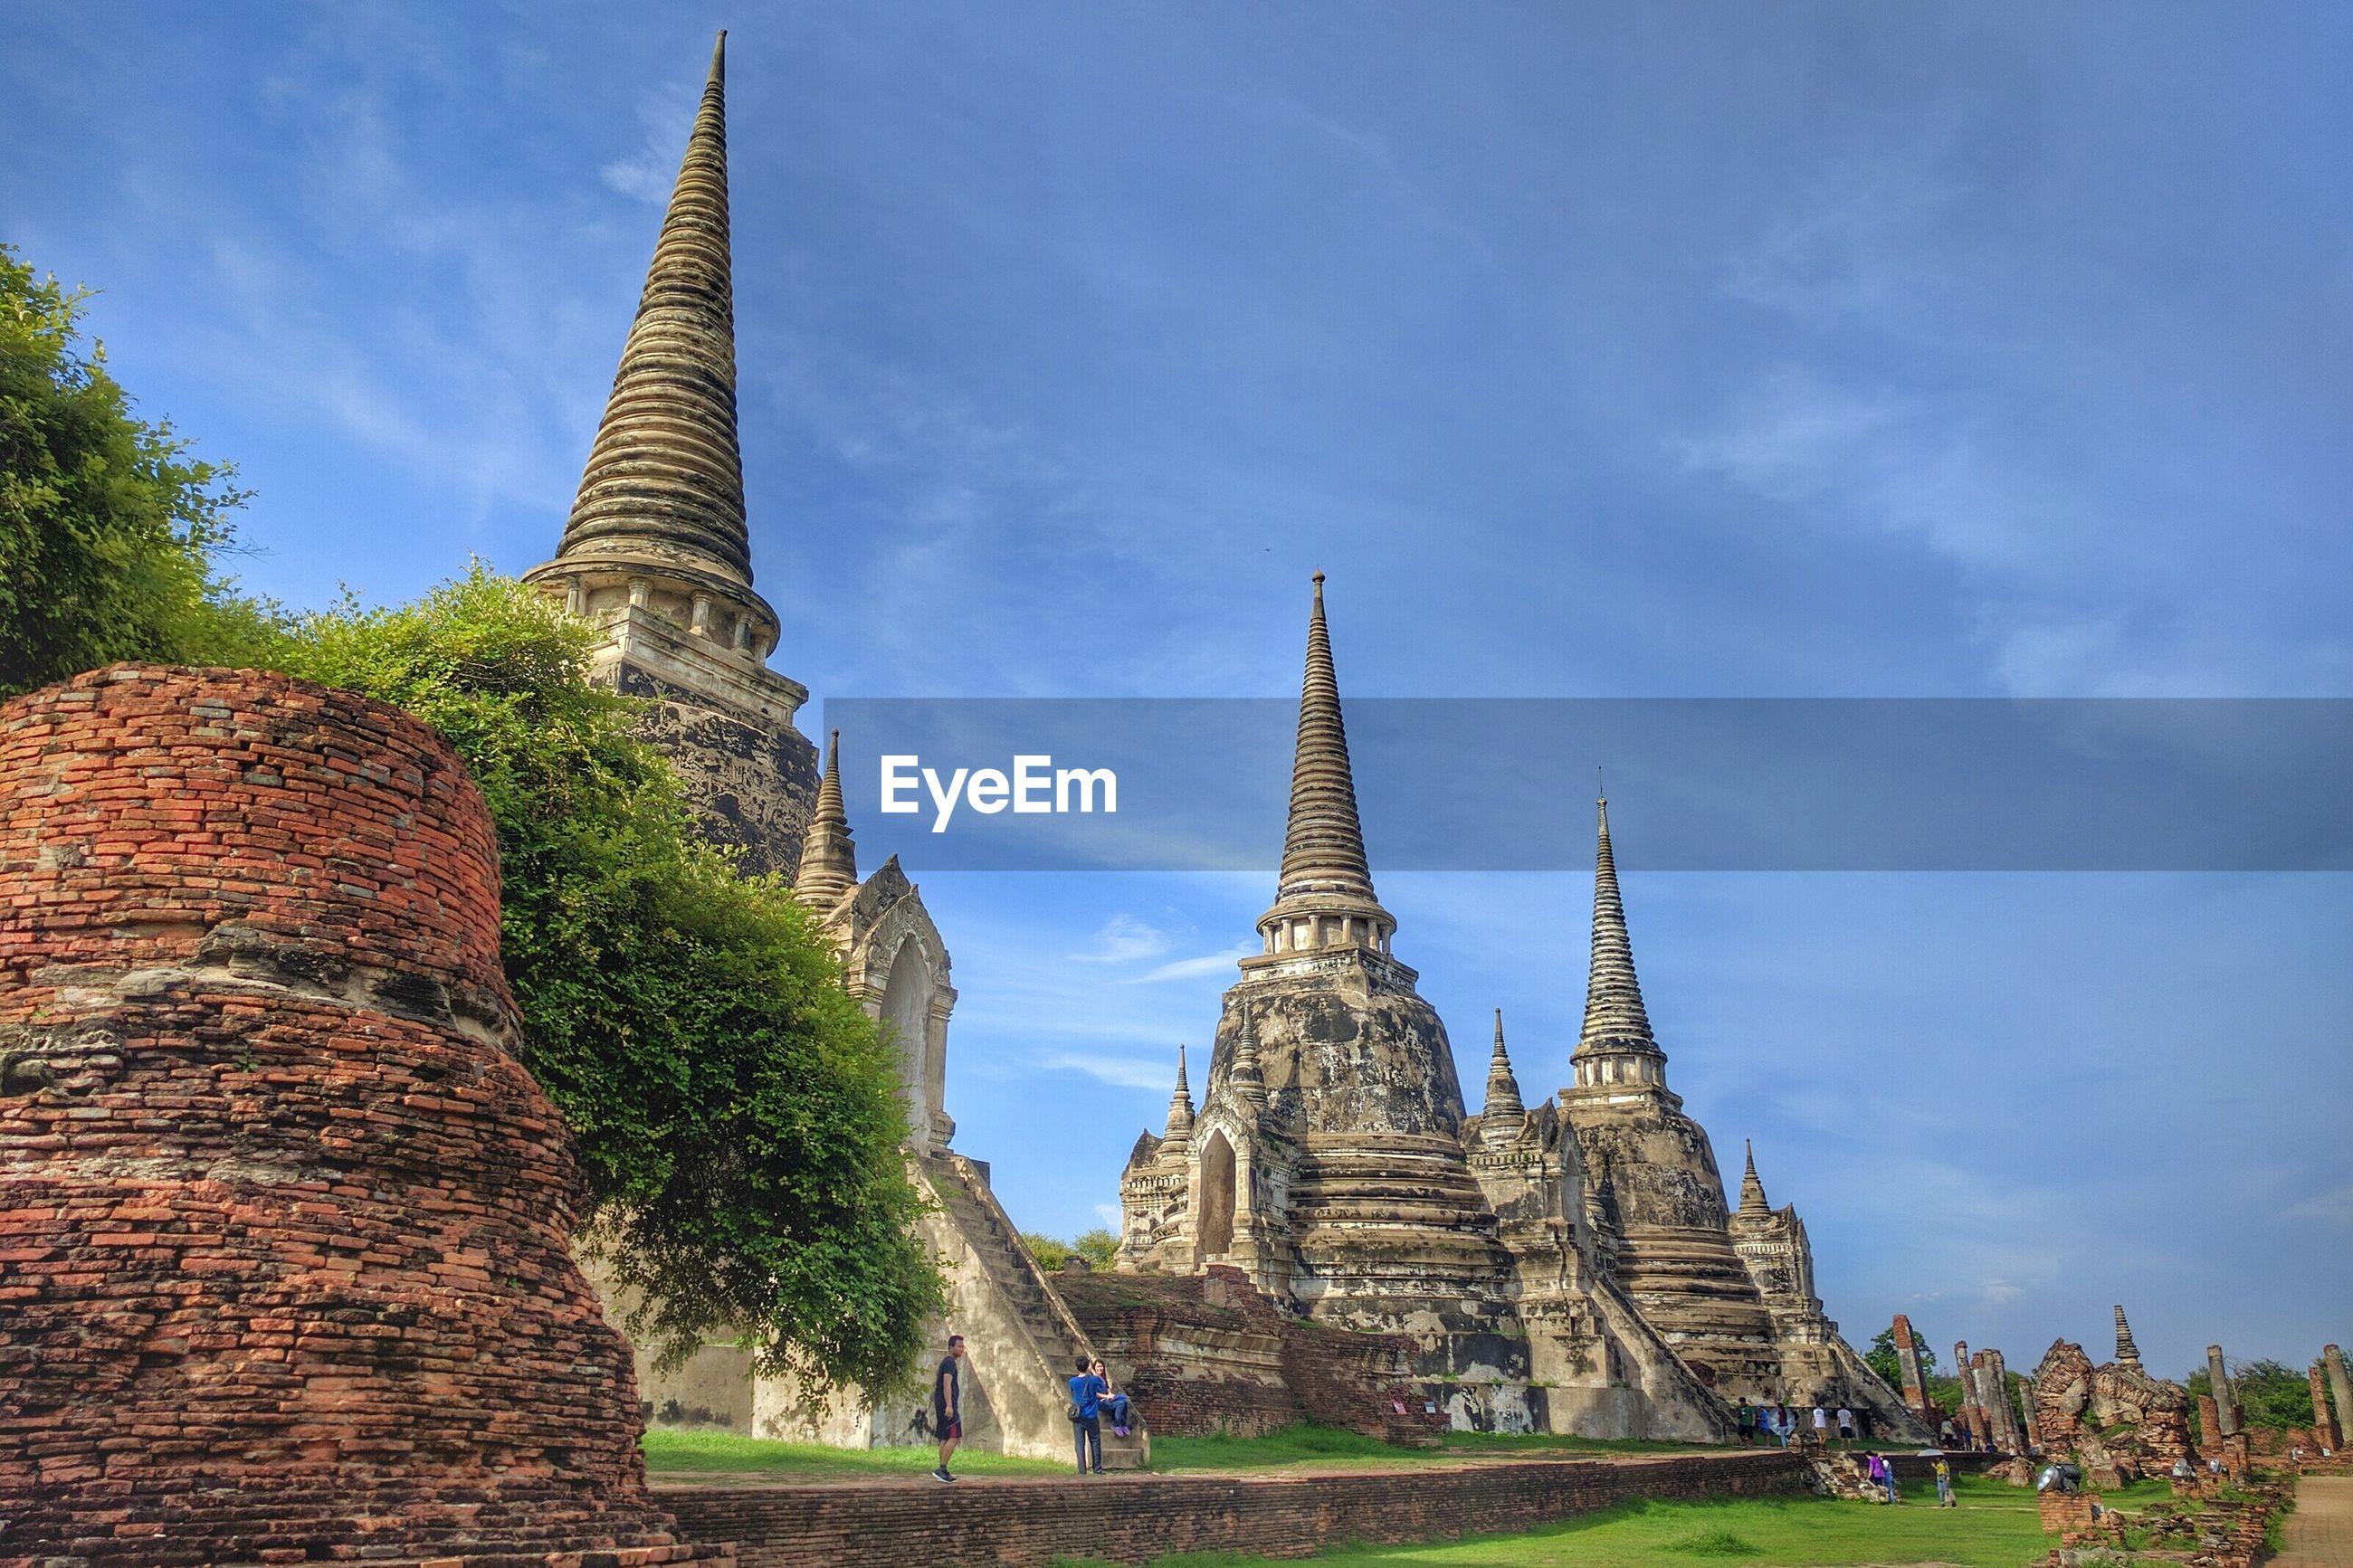 Wat phra sri sanphet temple at ayutthaya historical park against sky